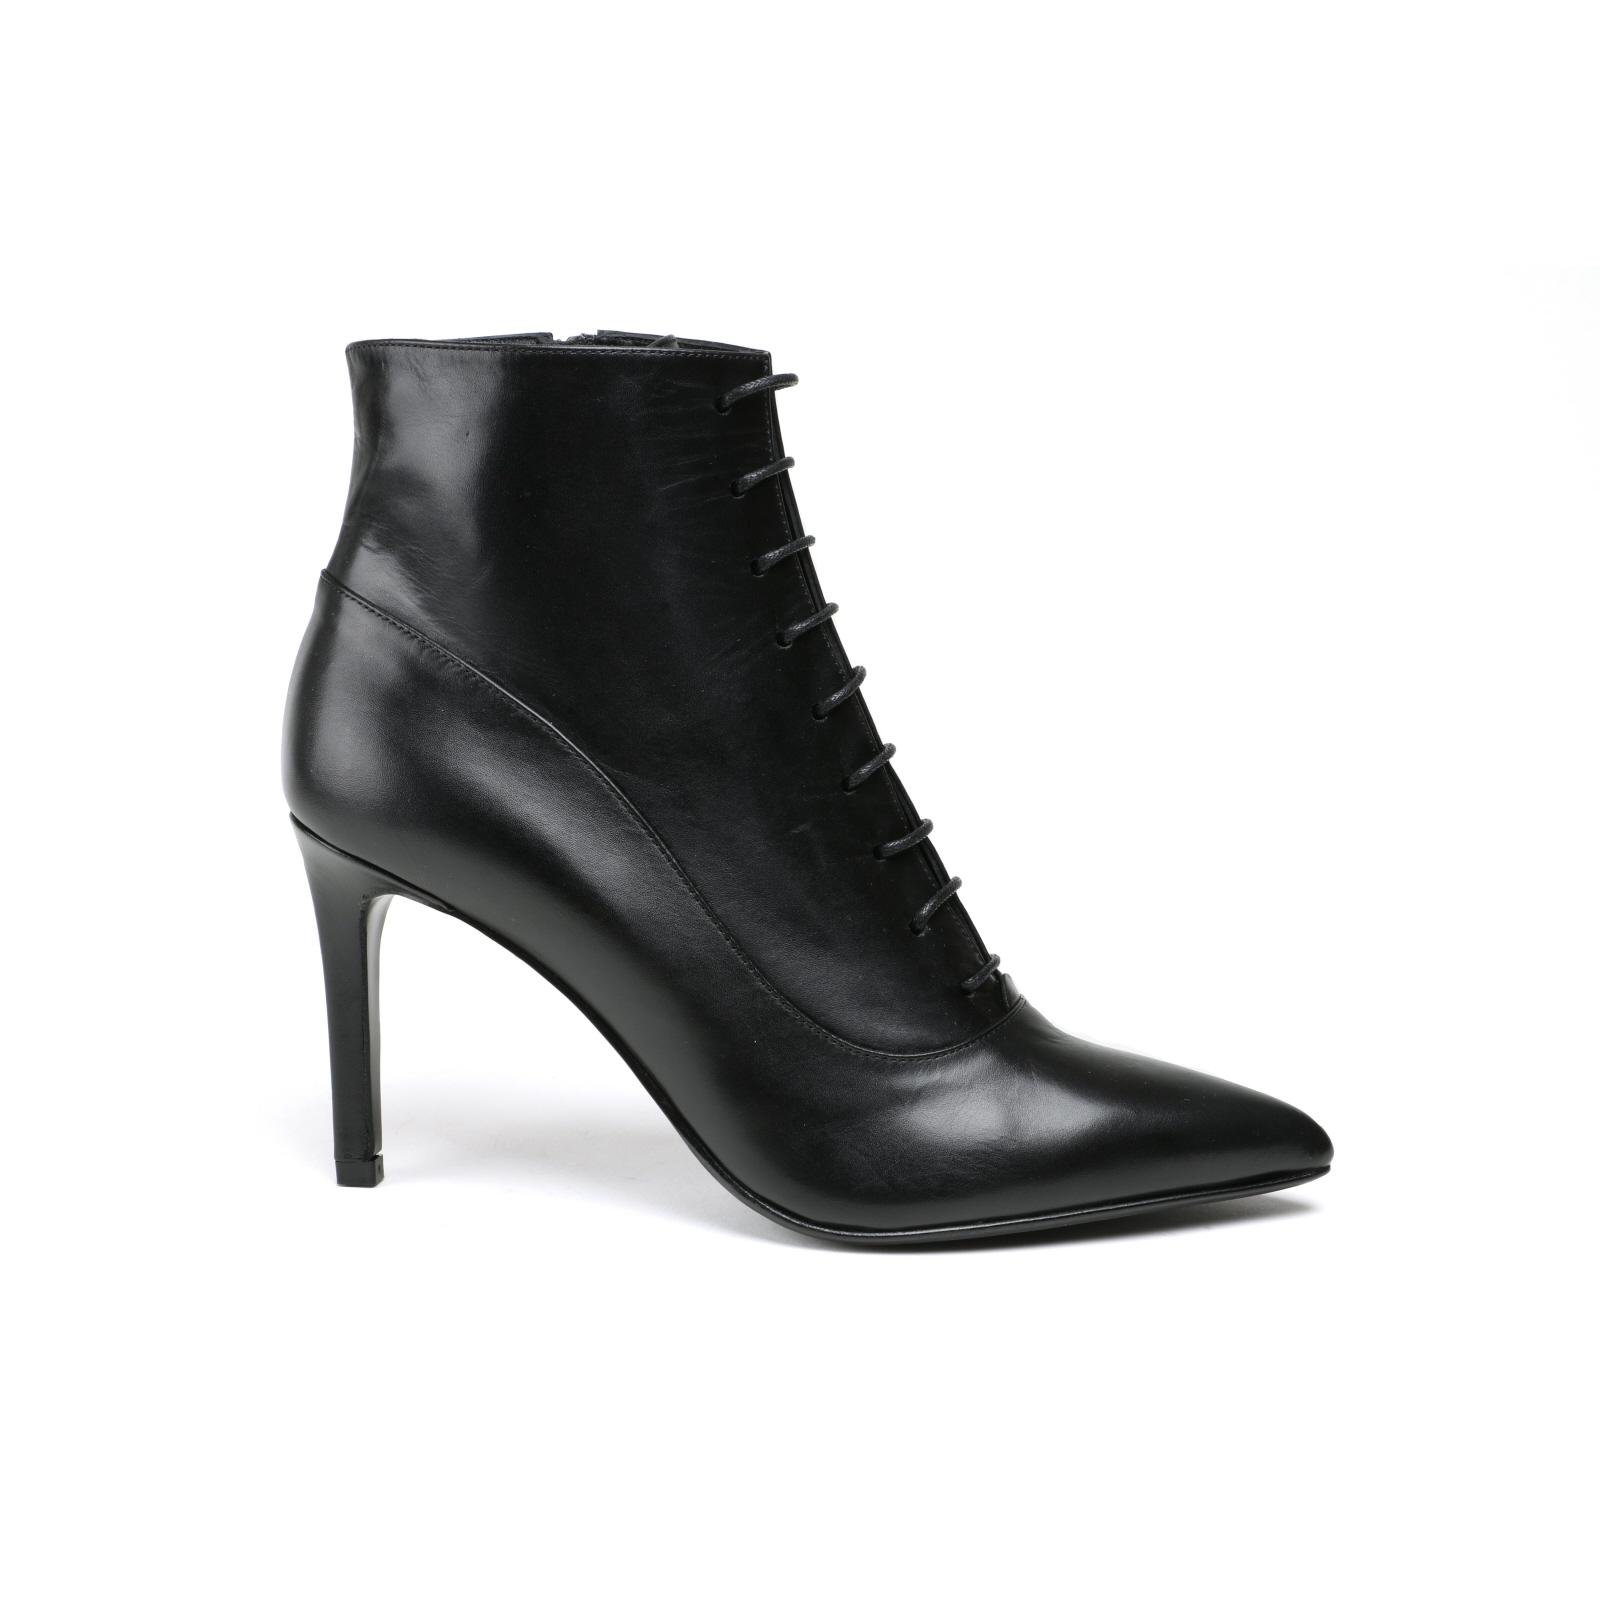 Damen Stiefelette Alberto Zago Elegant schwarz  Glattleder NEU Gr.38,5